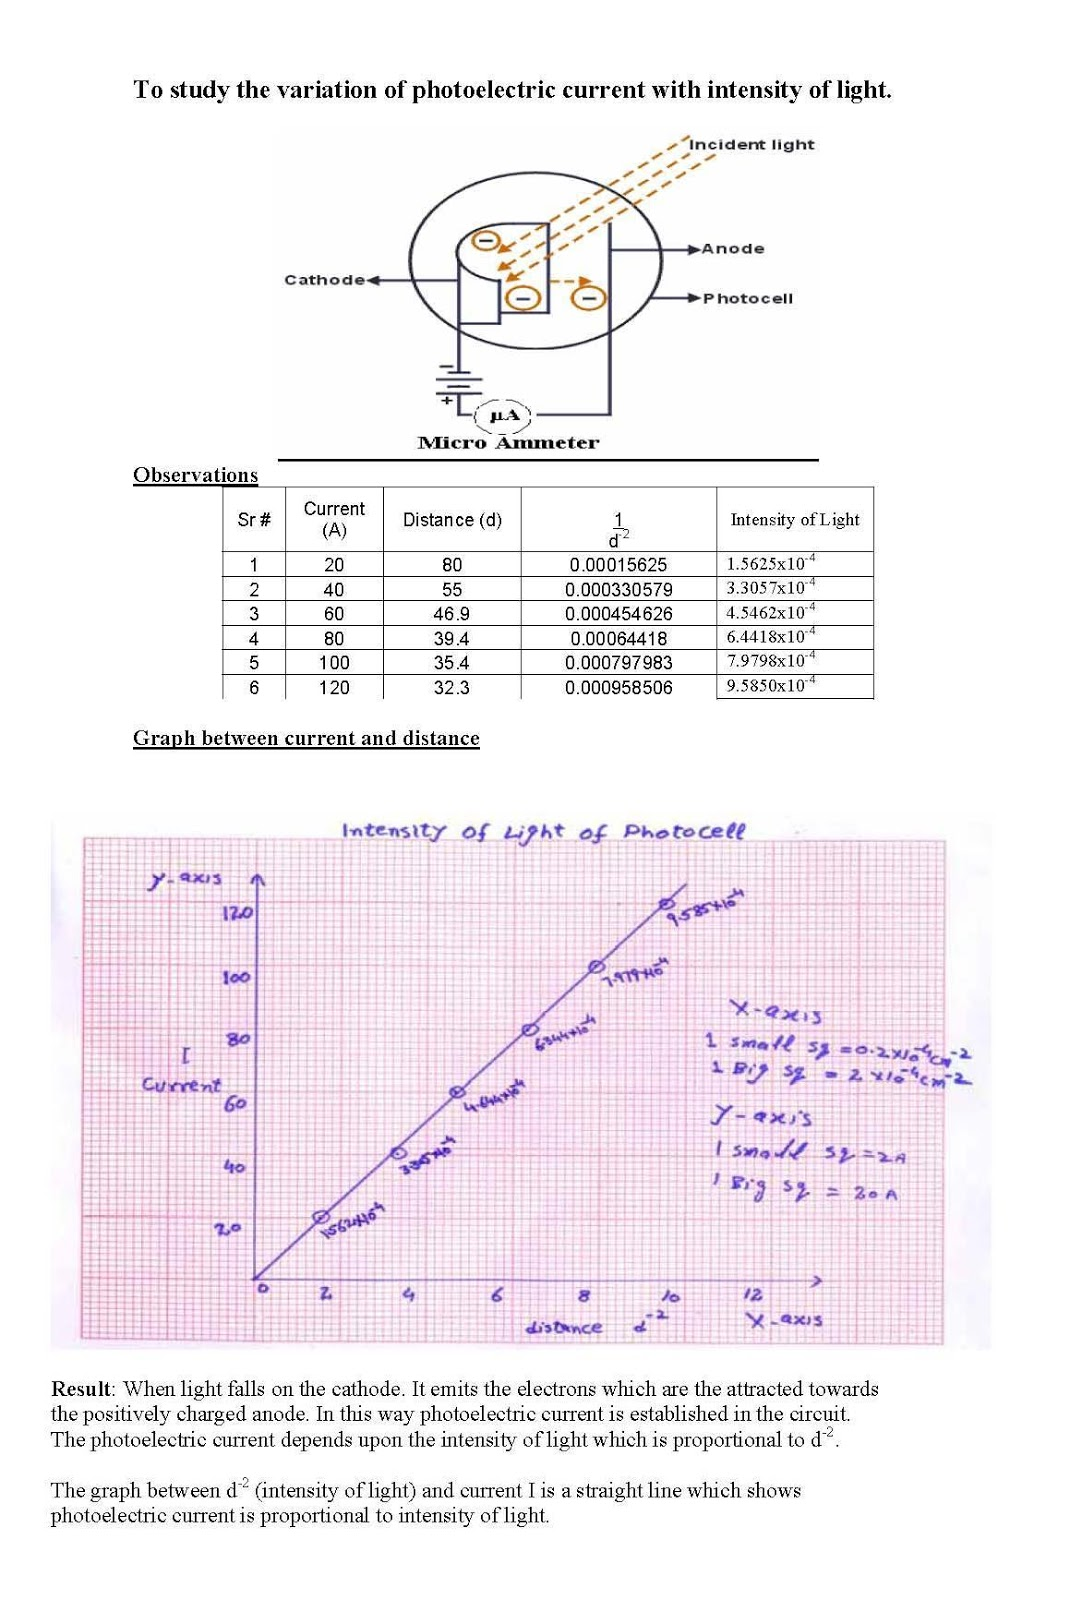 Physics Practicals : Physics Practicals (FSC Part II) for Light Gate Physics  146hul